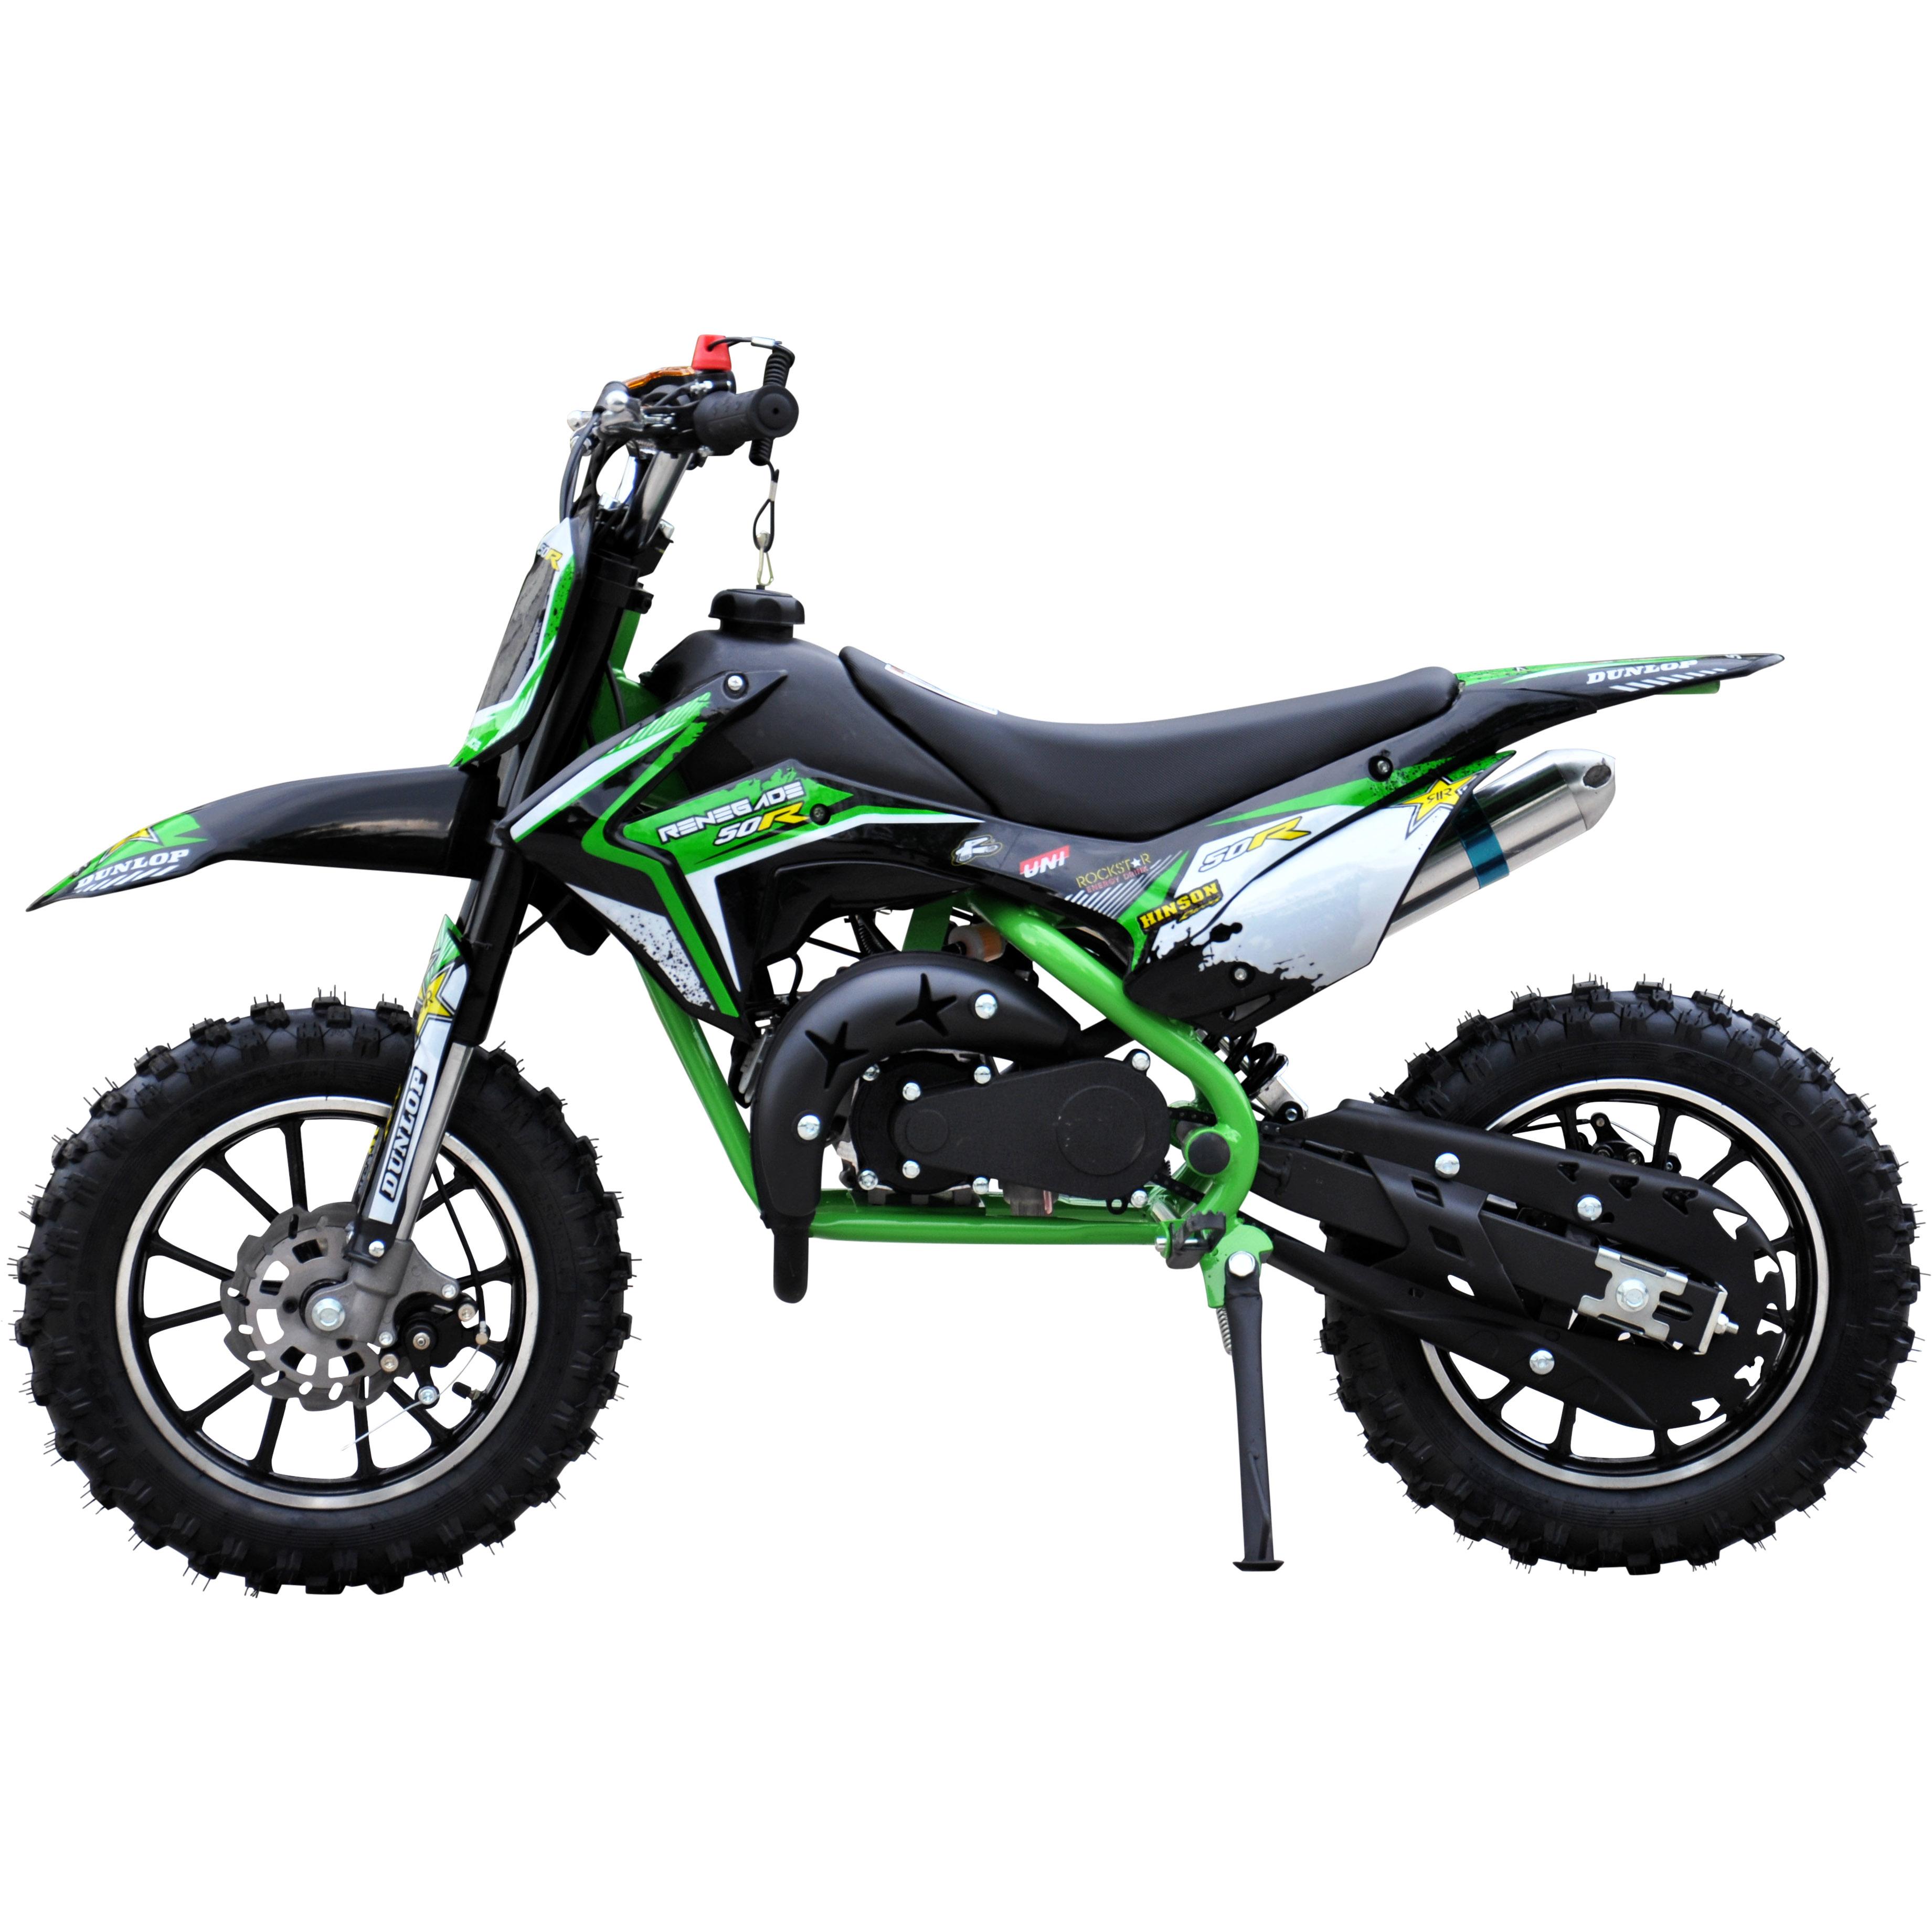 renegade 50r 49cc petrol kids mini dirt bike moto cross. Black Bedroom Furniture Sets. Home Design Ideas